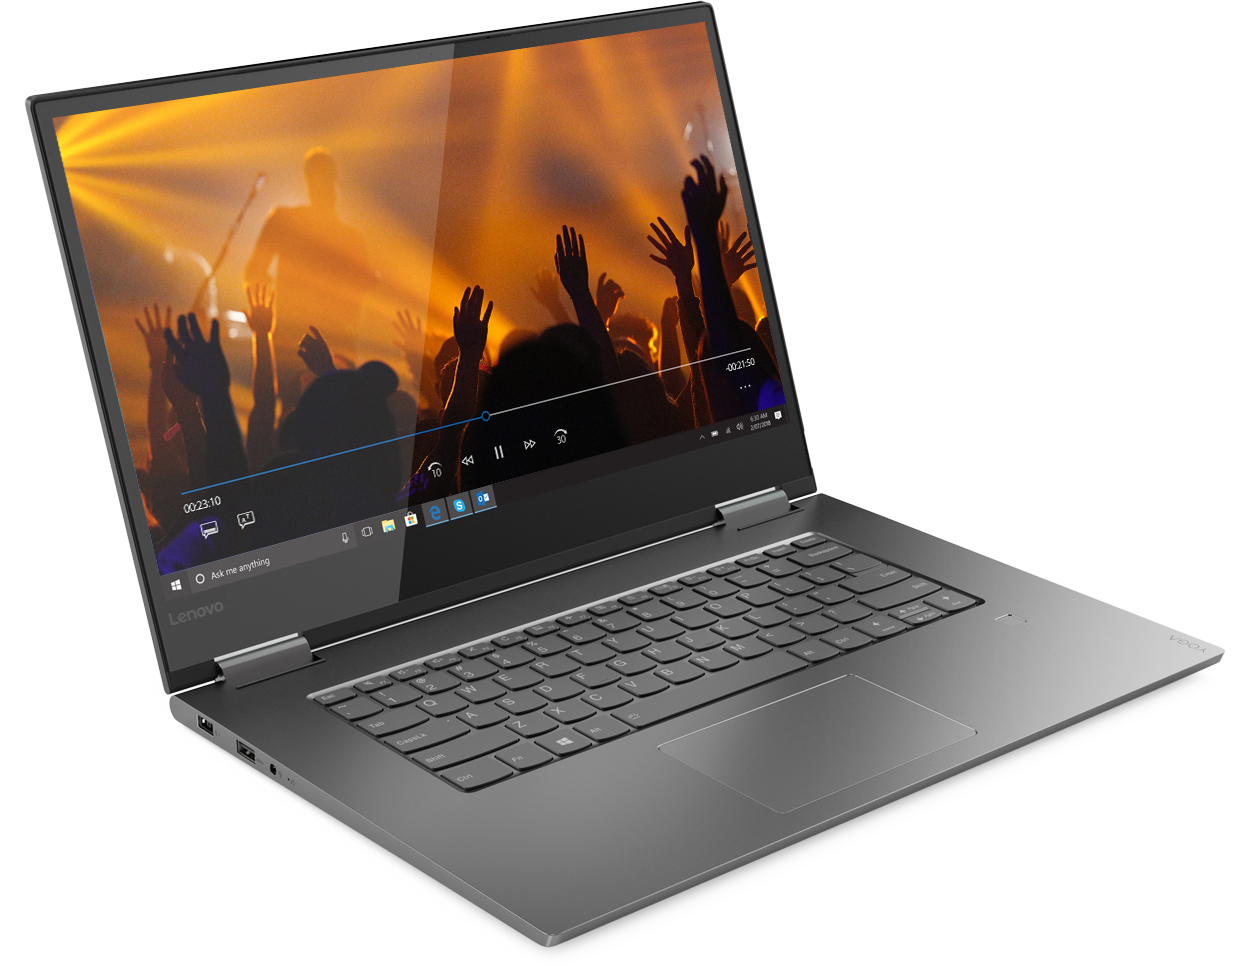 Lenovo at CES 2019: Yoga C730 Gets AMOLED Display